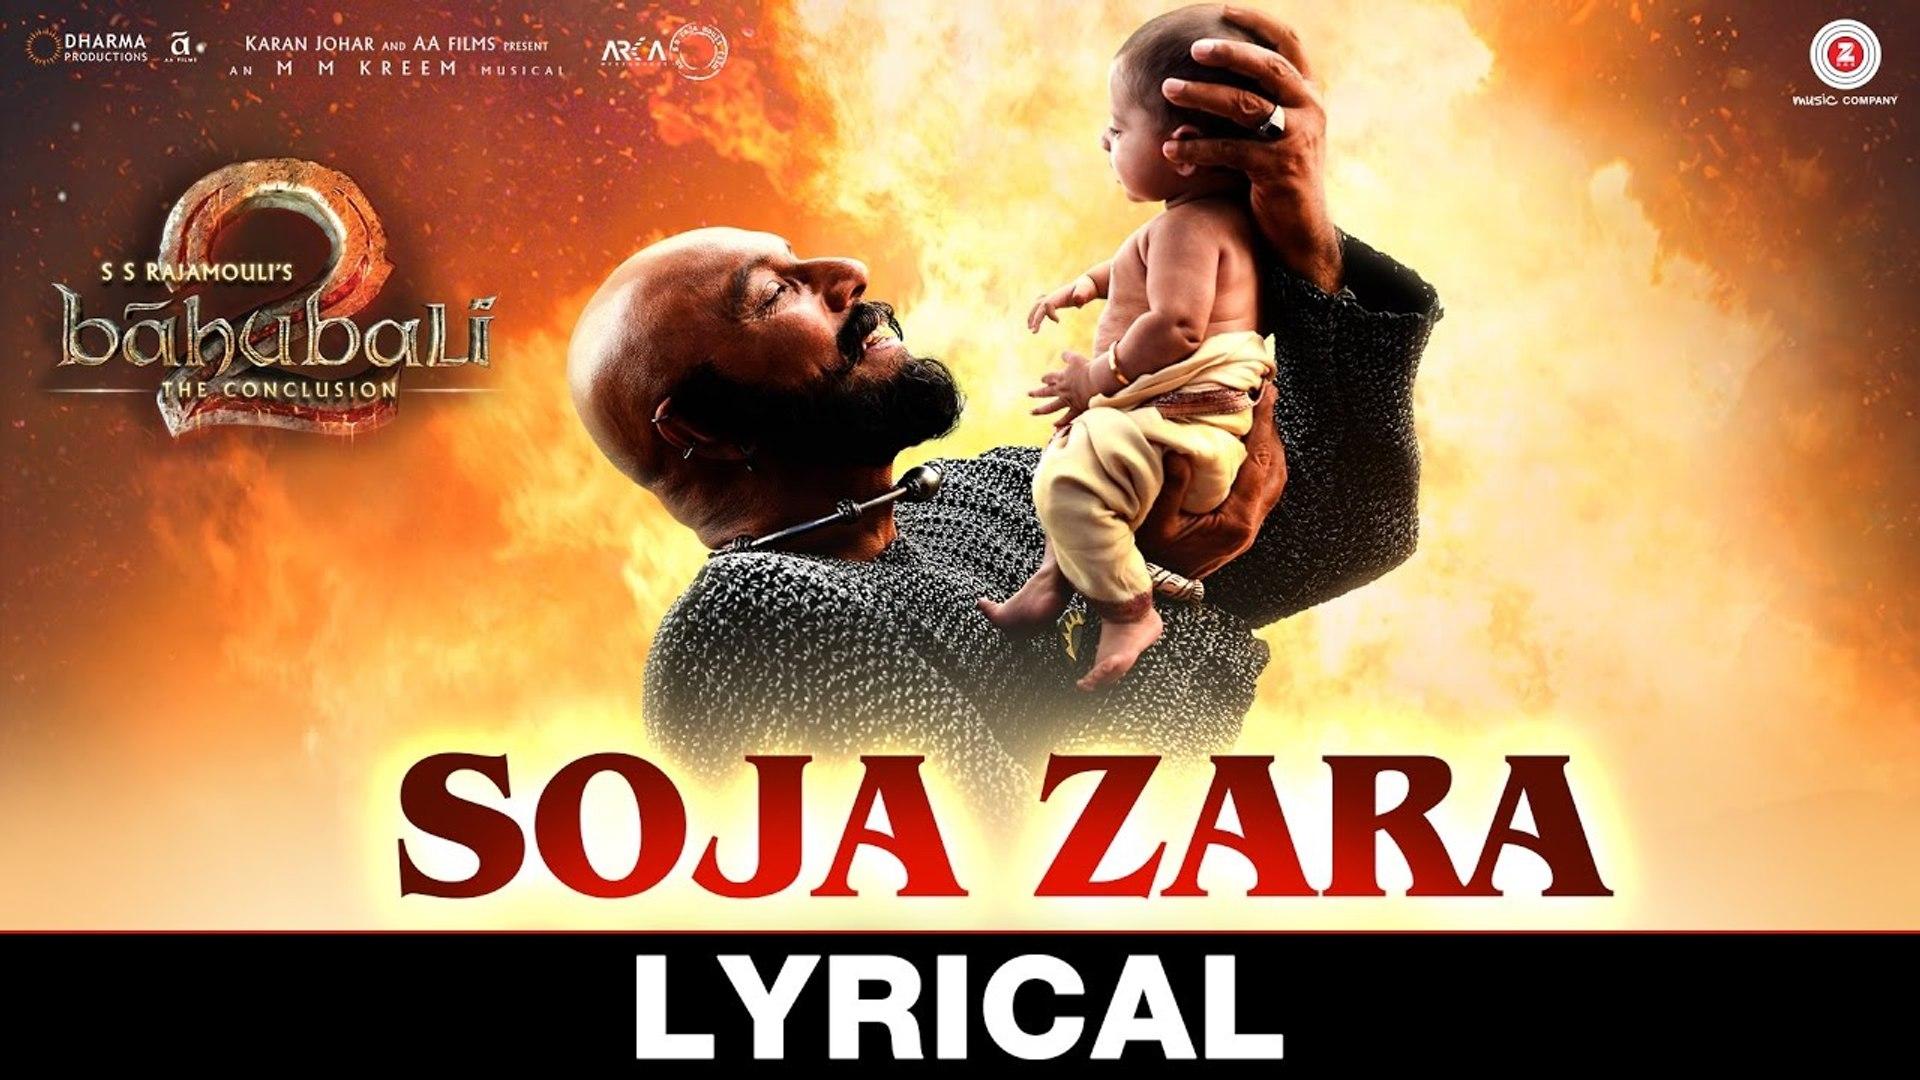 Soja Zara Lyrical Song Baahubali 2 The Conclusion 2017 Anushka Shetty Prabhas Satyaraj Video Dailymotion